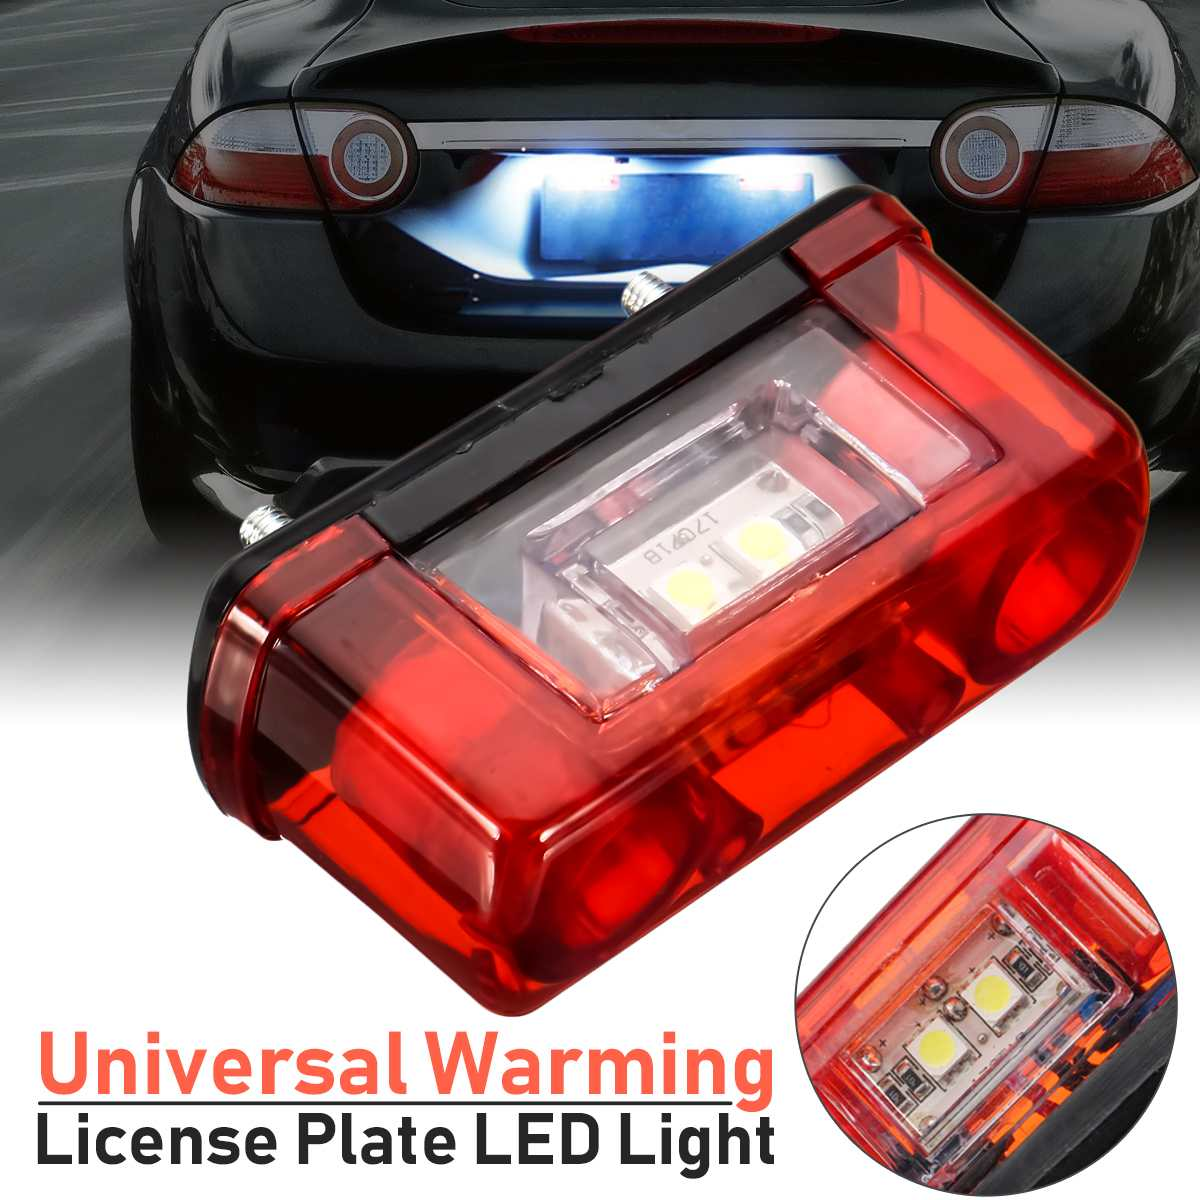 New Type 12v 24v Car Led License Number Plate Light Lamp Universal Led License Plate Car Truck Trailer Lorry Rear Tail Light